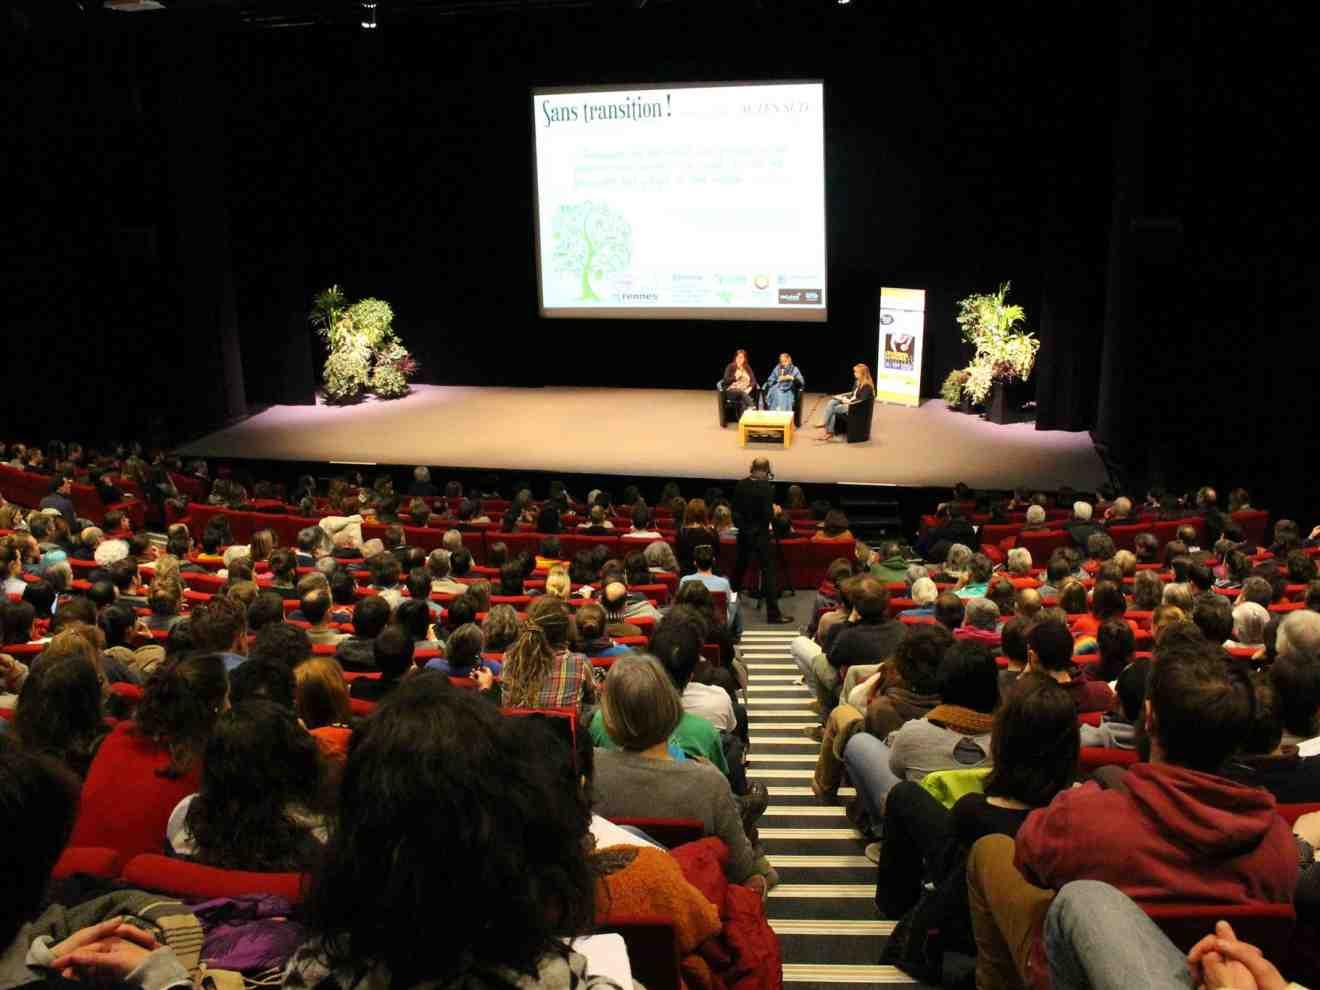 Vandana Shiva à Rennes devant 700 personnes